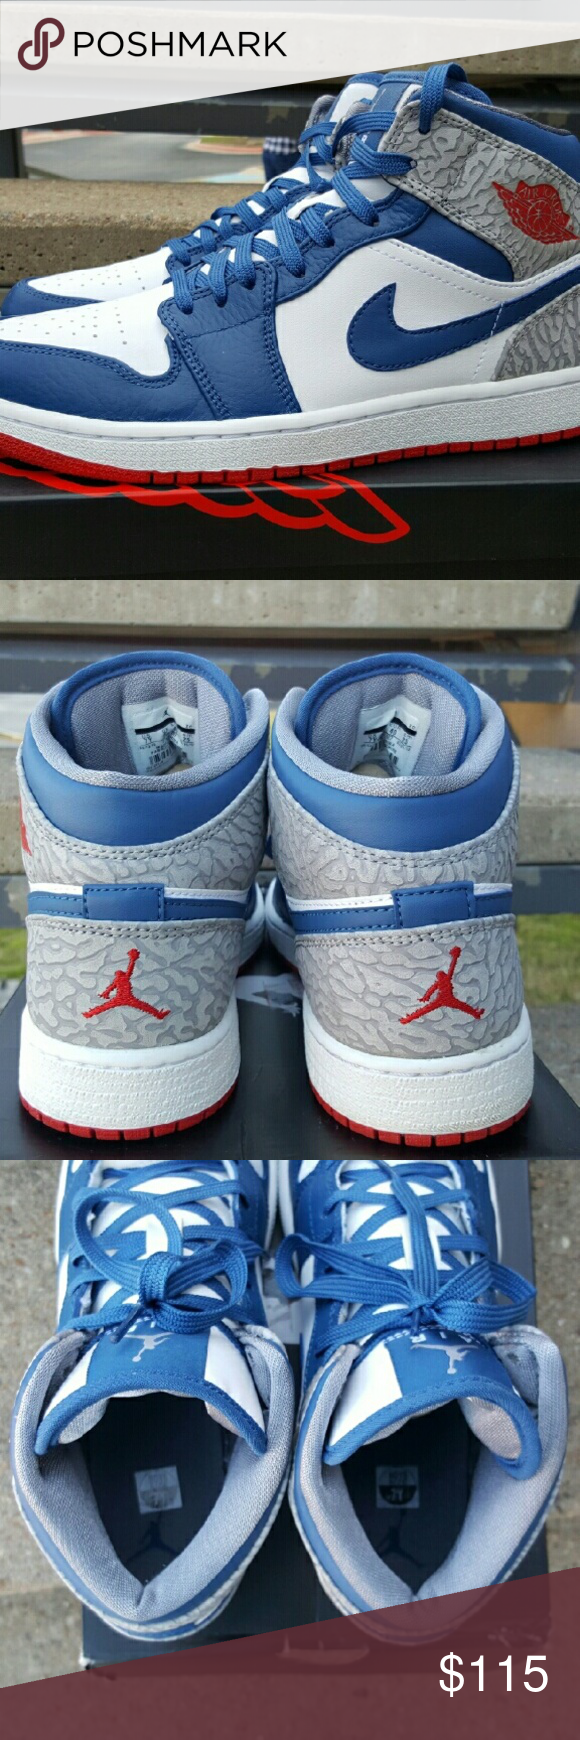 best sneakers 98986 0e536 Air jordan retro 1s true blue cement rare 7y Great shape normal wear and  tear normal air jordan Shoes Sneakers